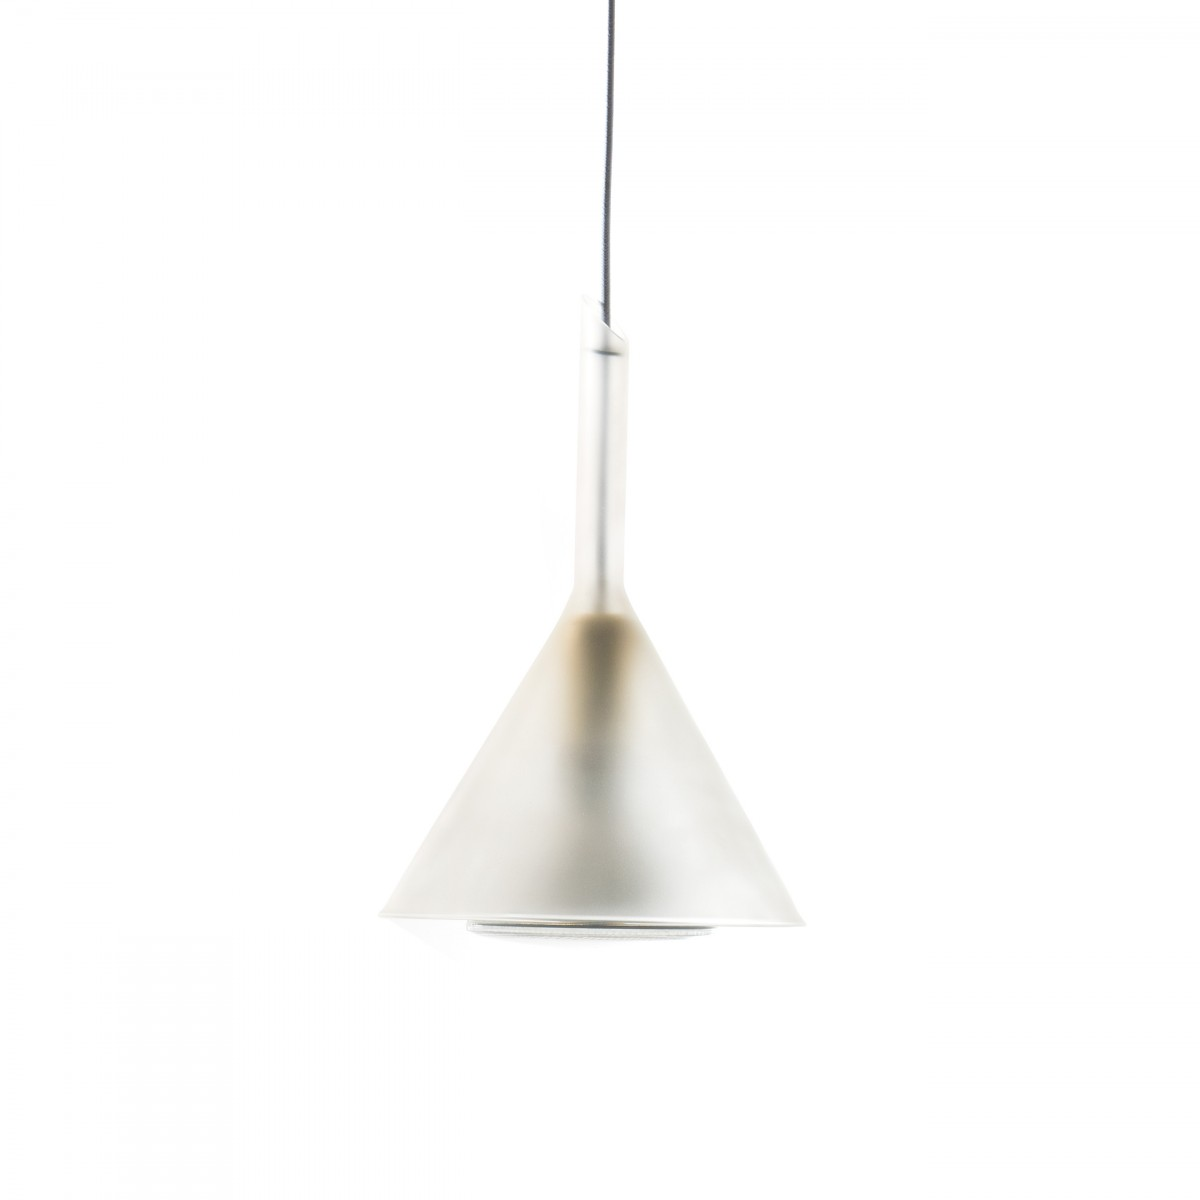 TRICHTER LAMPE MILCH